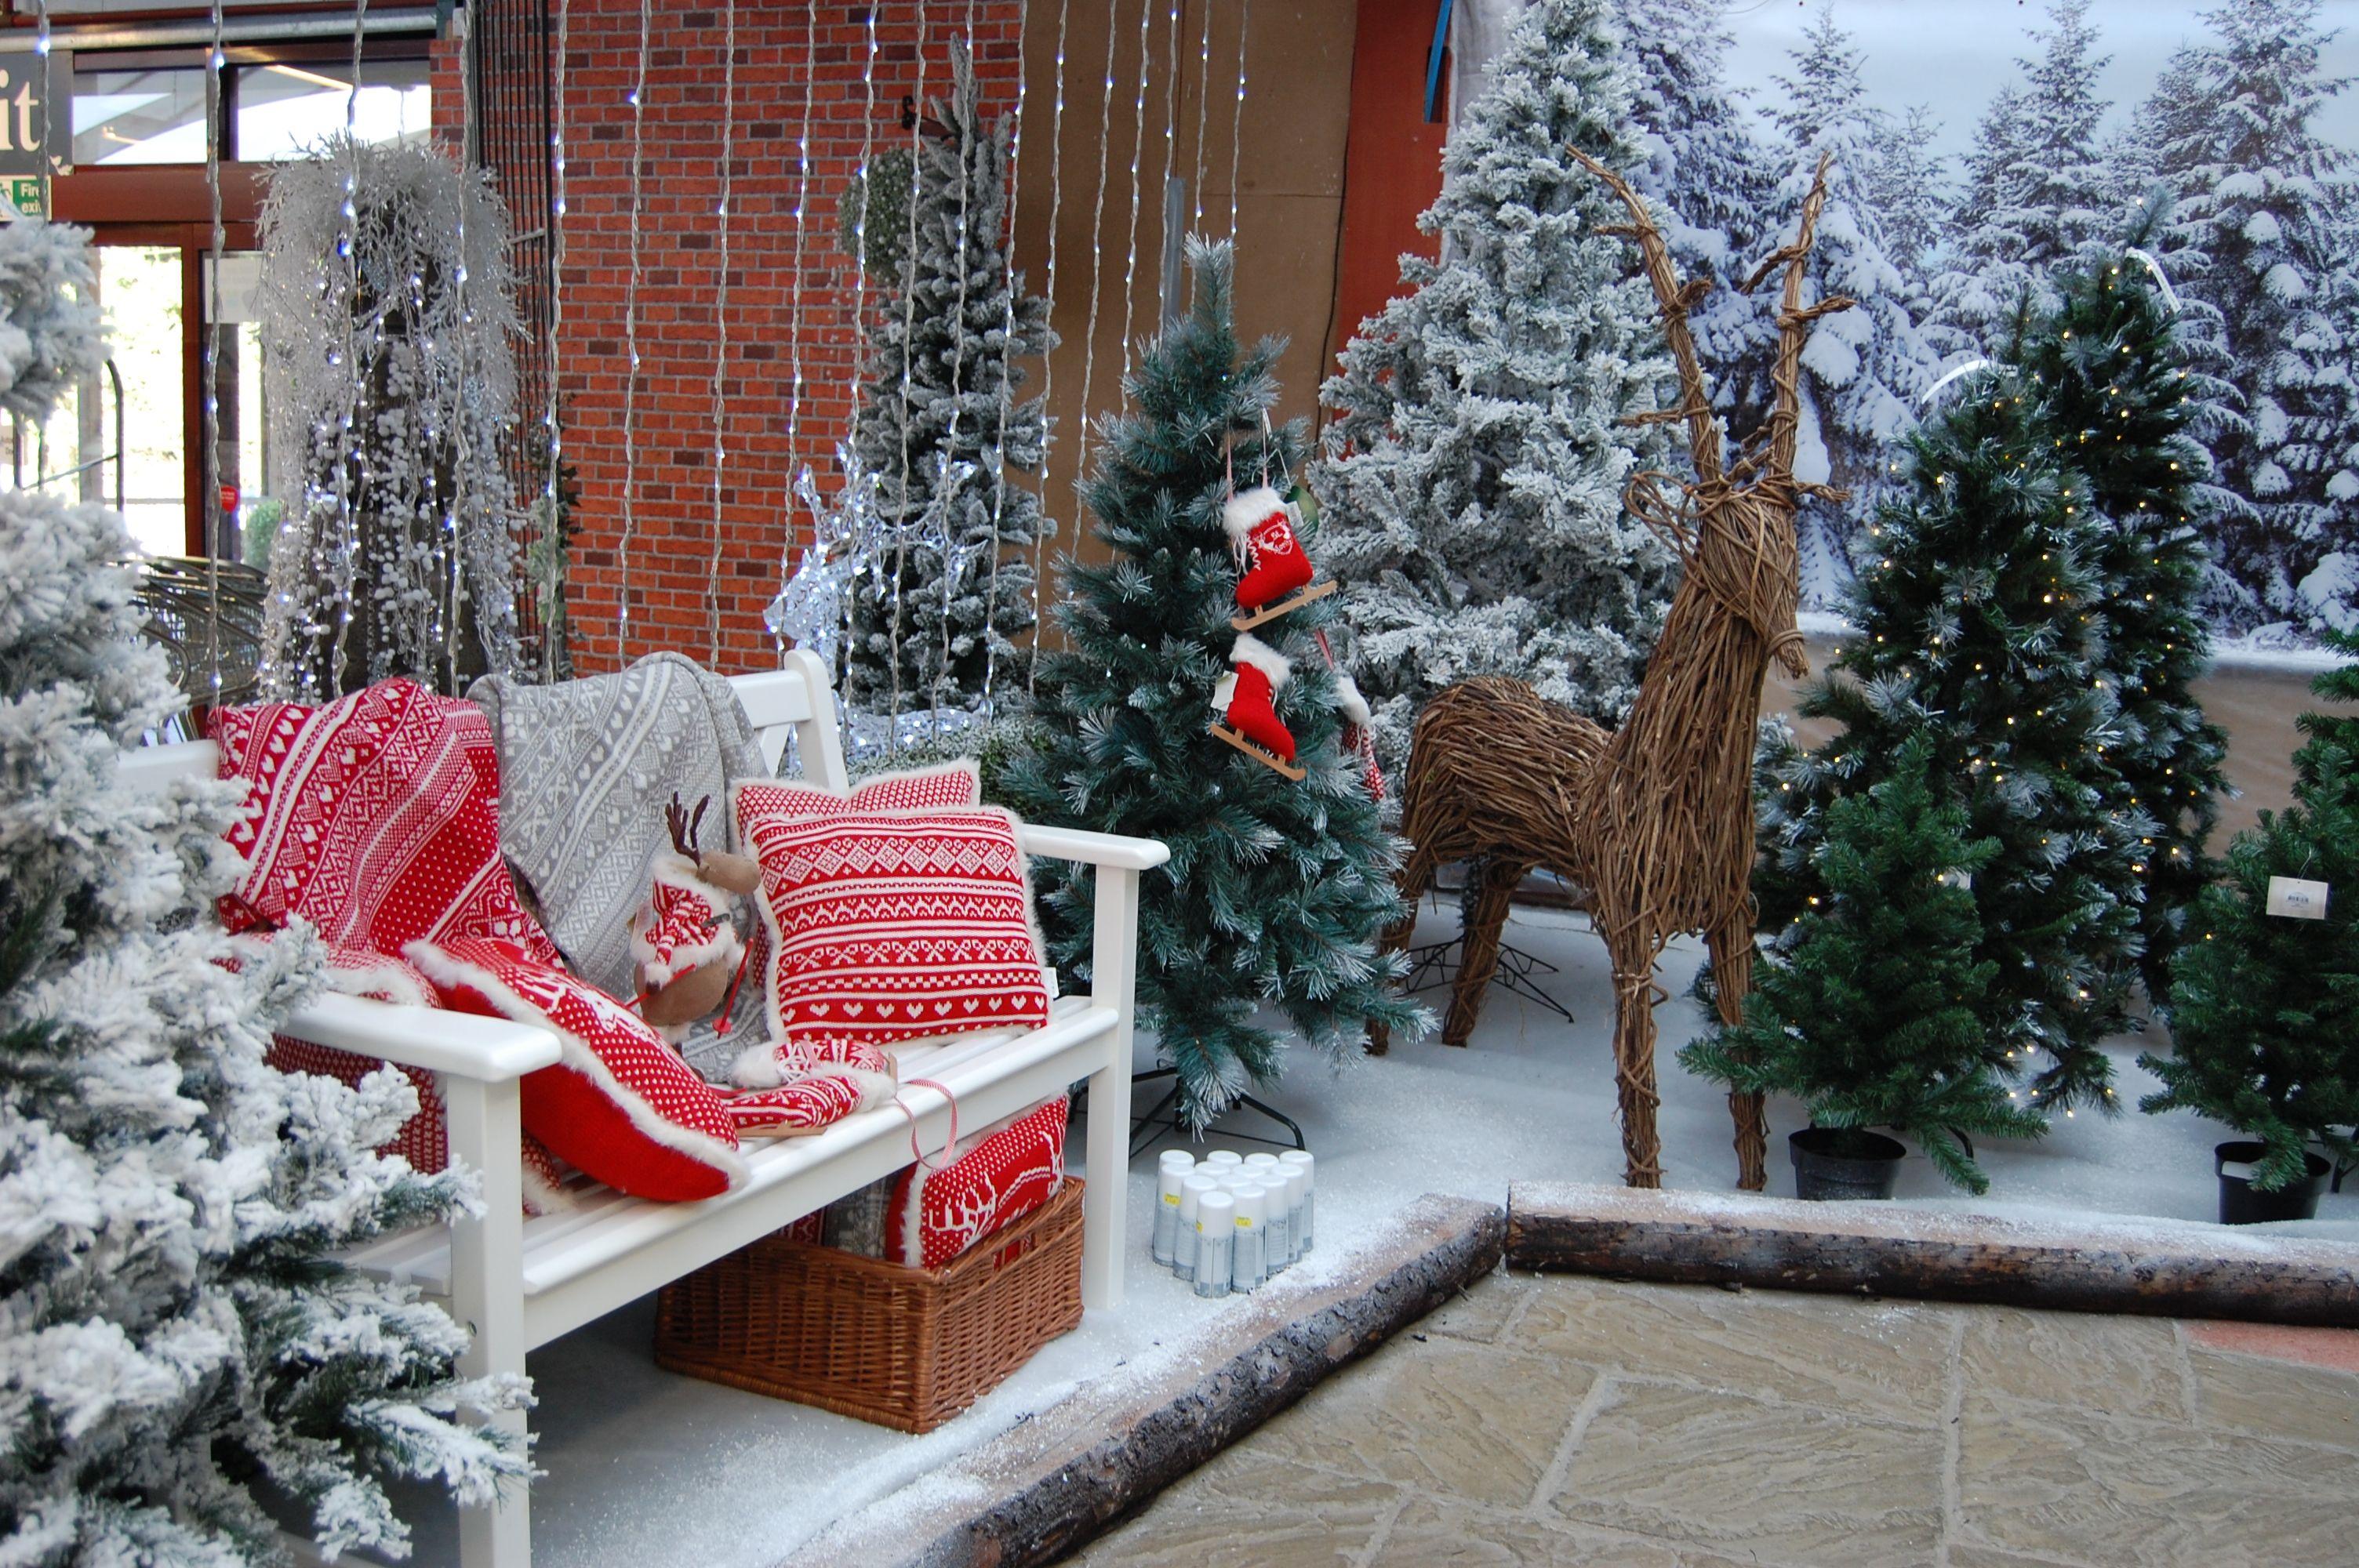 Winter Wonderland With Artificial Trees Christmas Display Winter Wonderland Decorations Winter Wonderland Christmas